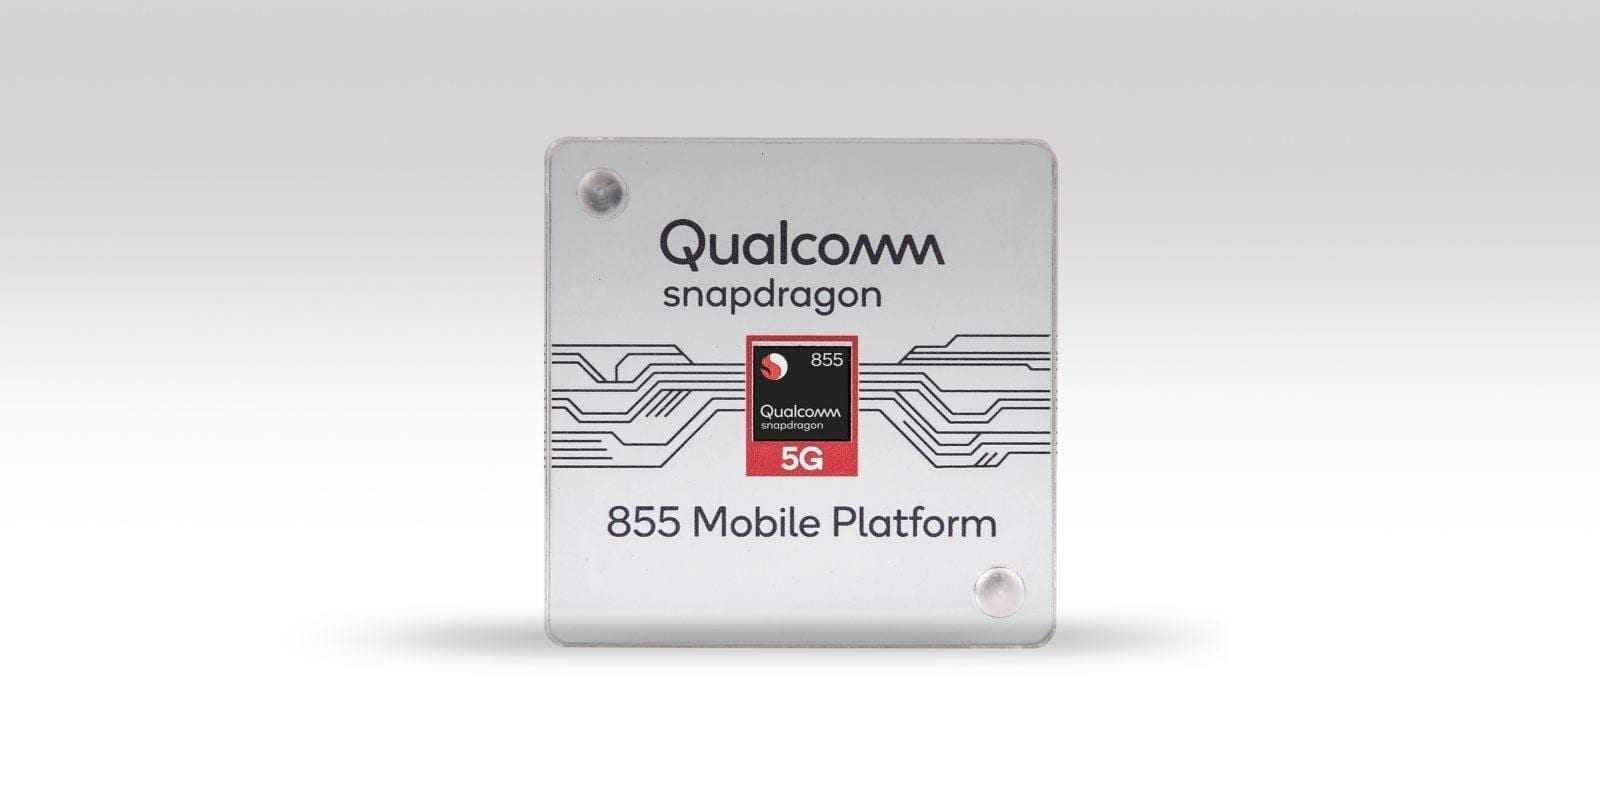 Qualcomm анонсировал процессор Snapdragon 855 для 5G-смартфонов (Qualcomm Snpadragon 855 Android)